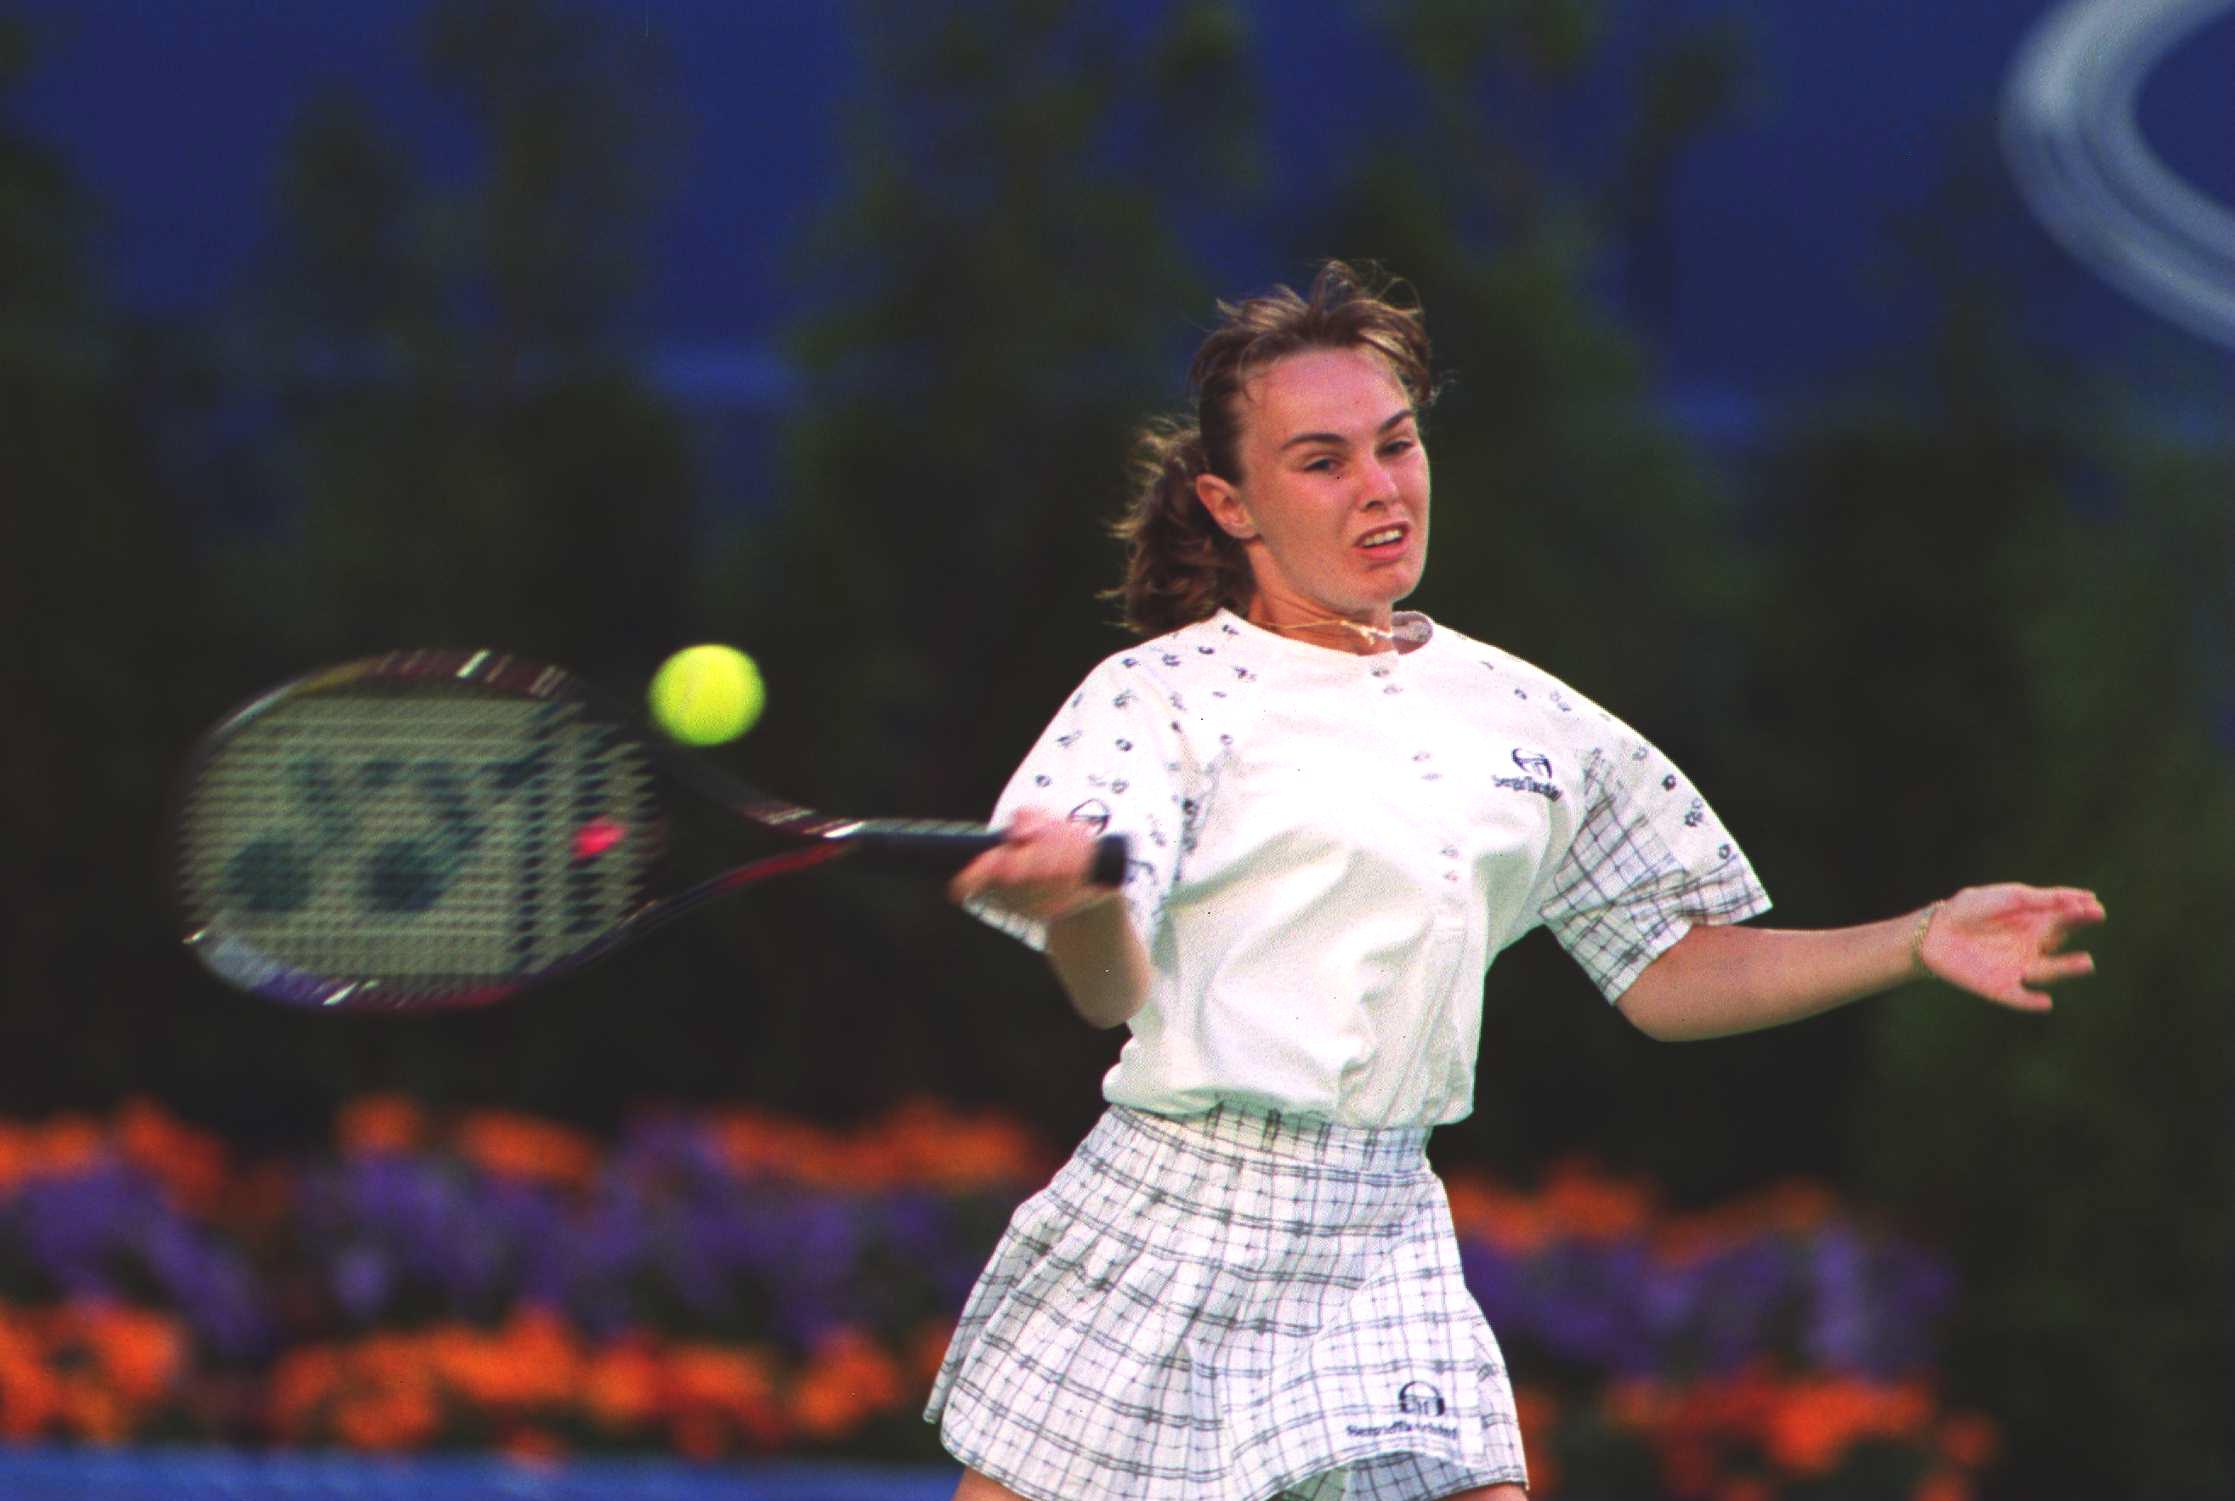 Martina Hingis participating at the Australian Open, aged 16